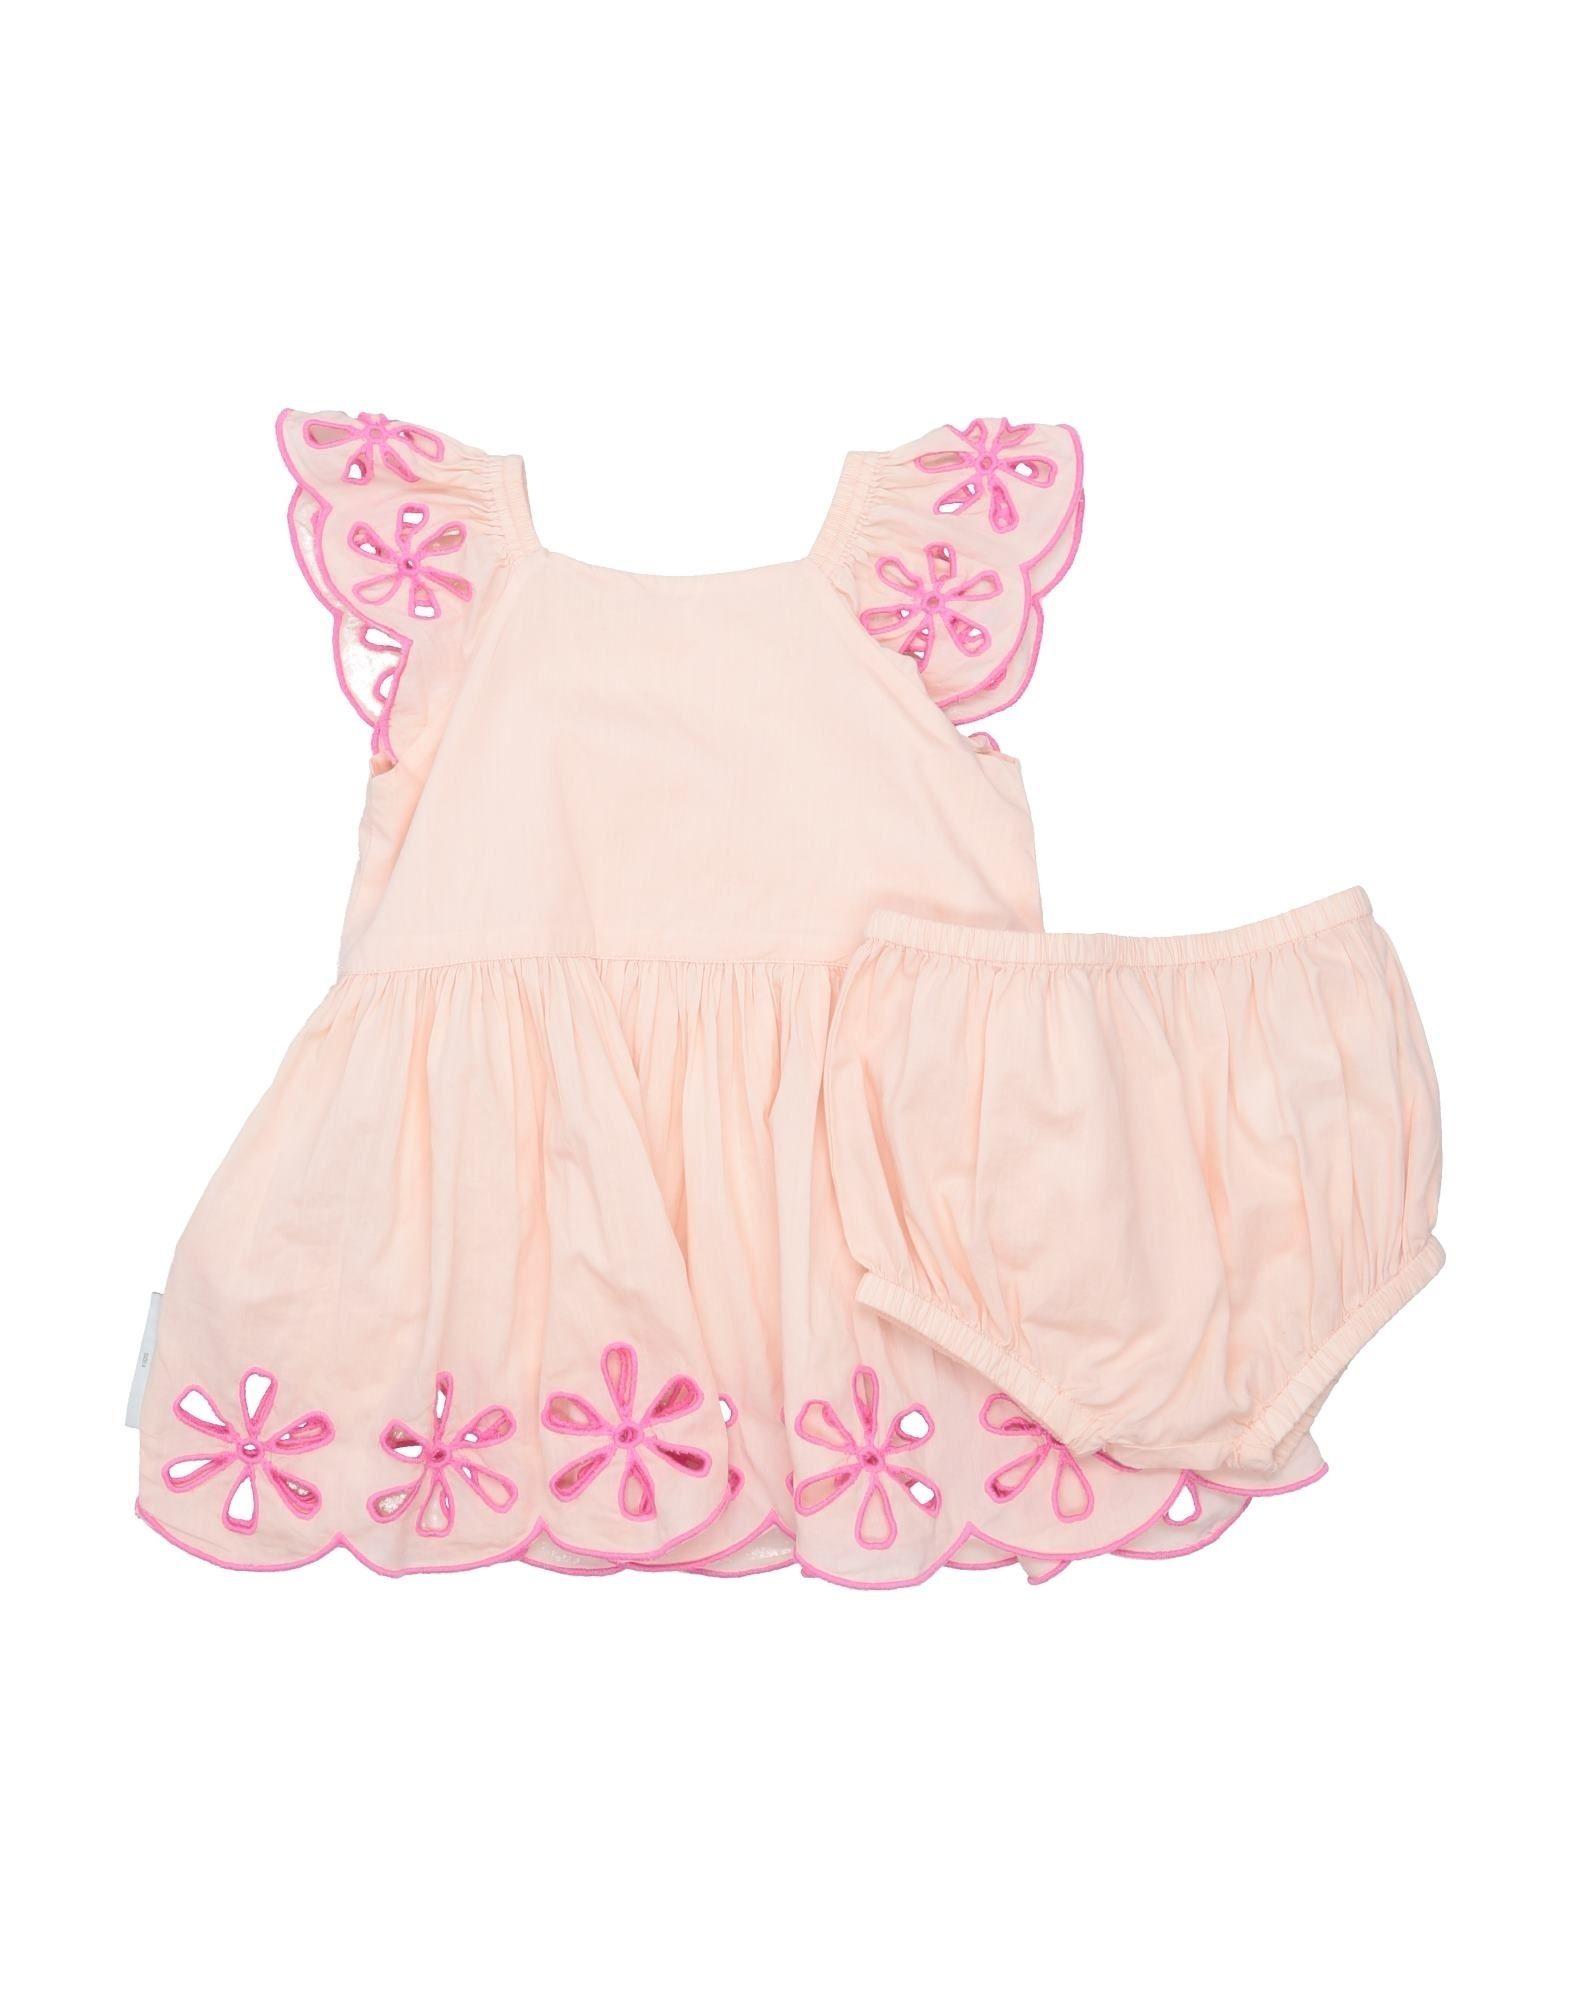 STELLA McCARTNEY KIDS Dresses - Item 15043084